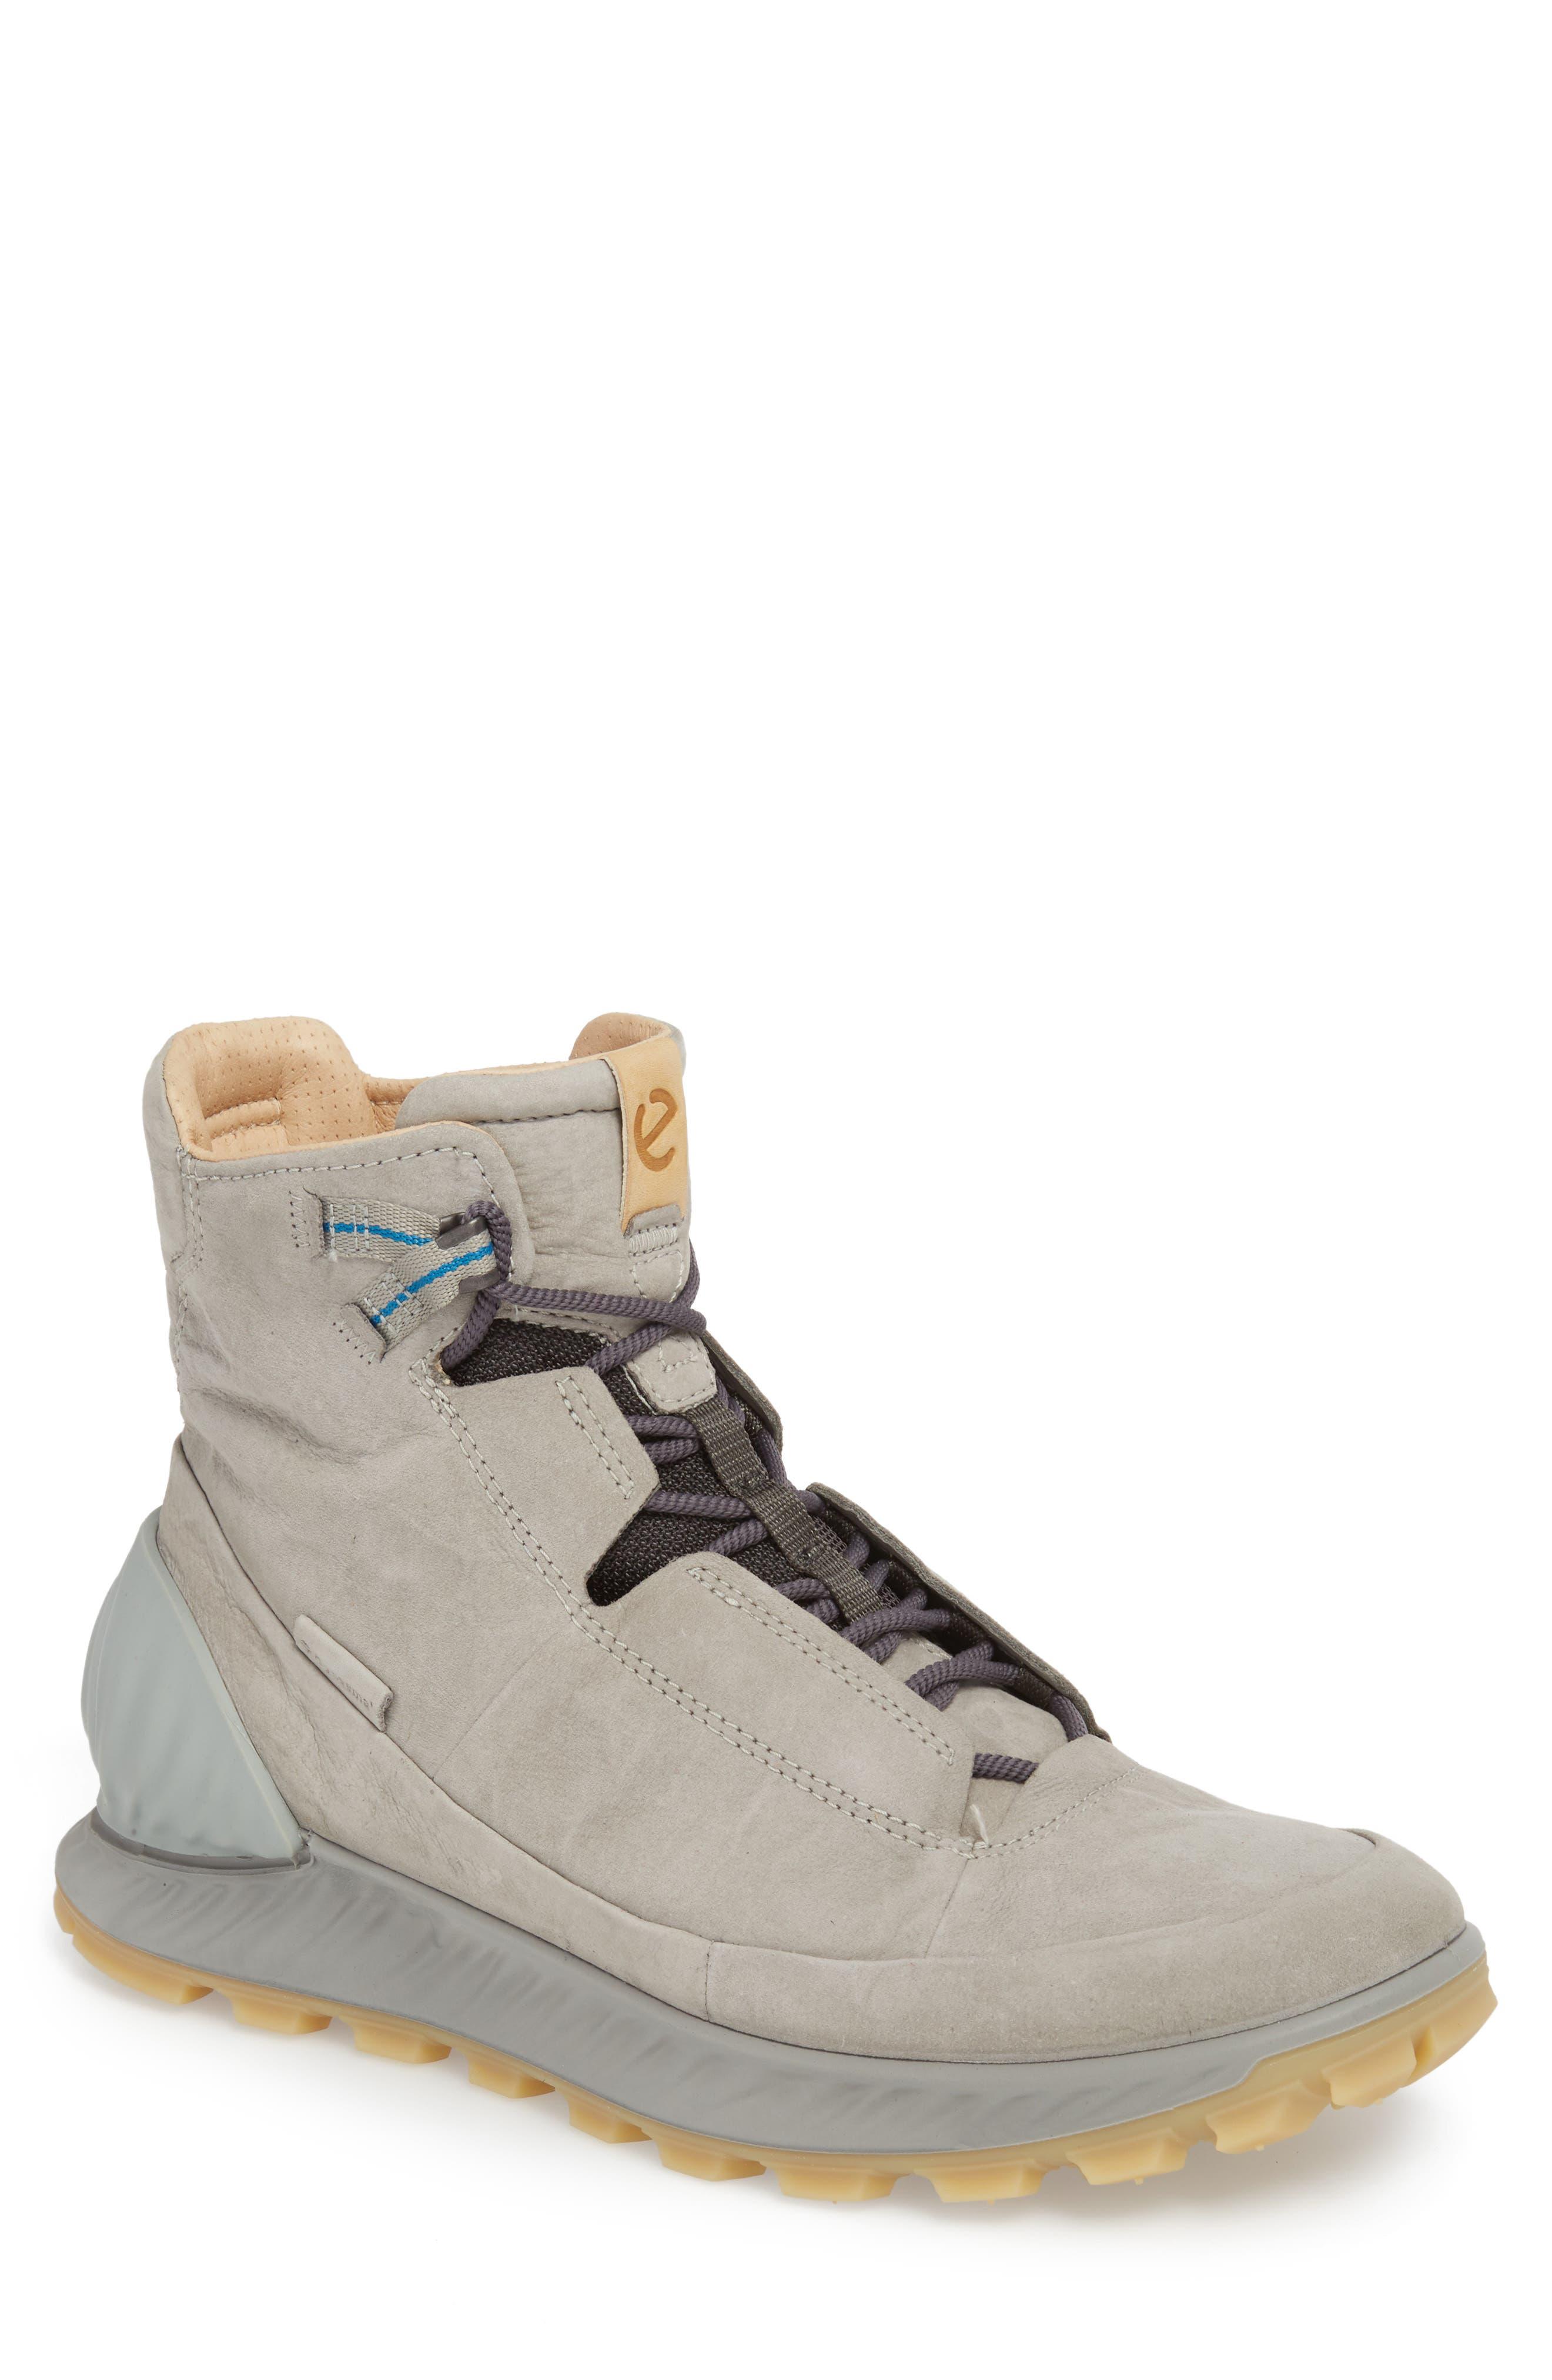 Ecco Limited Edition Exostrike Dyneema Sneaker Boot - Grey